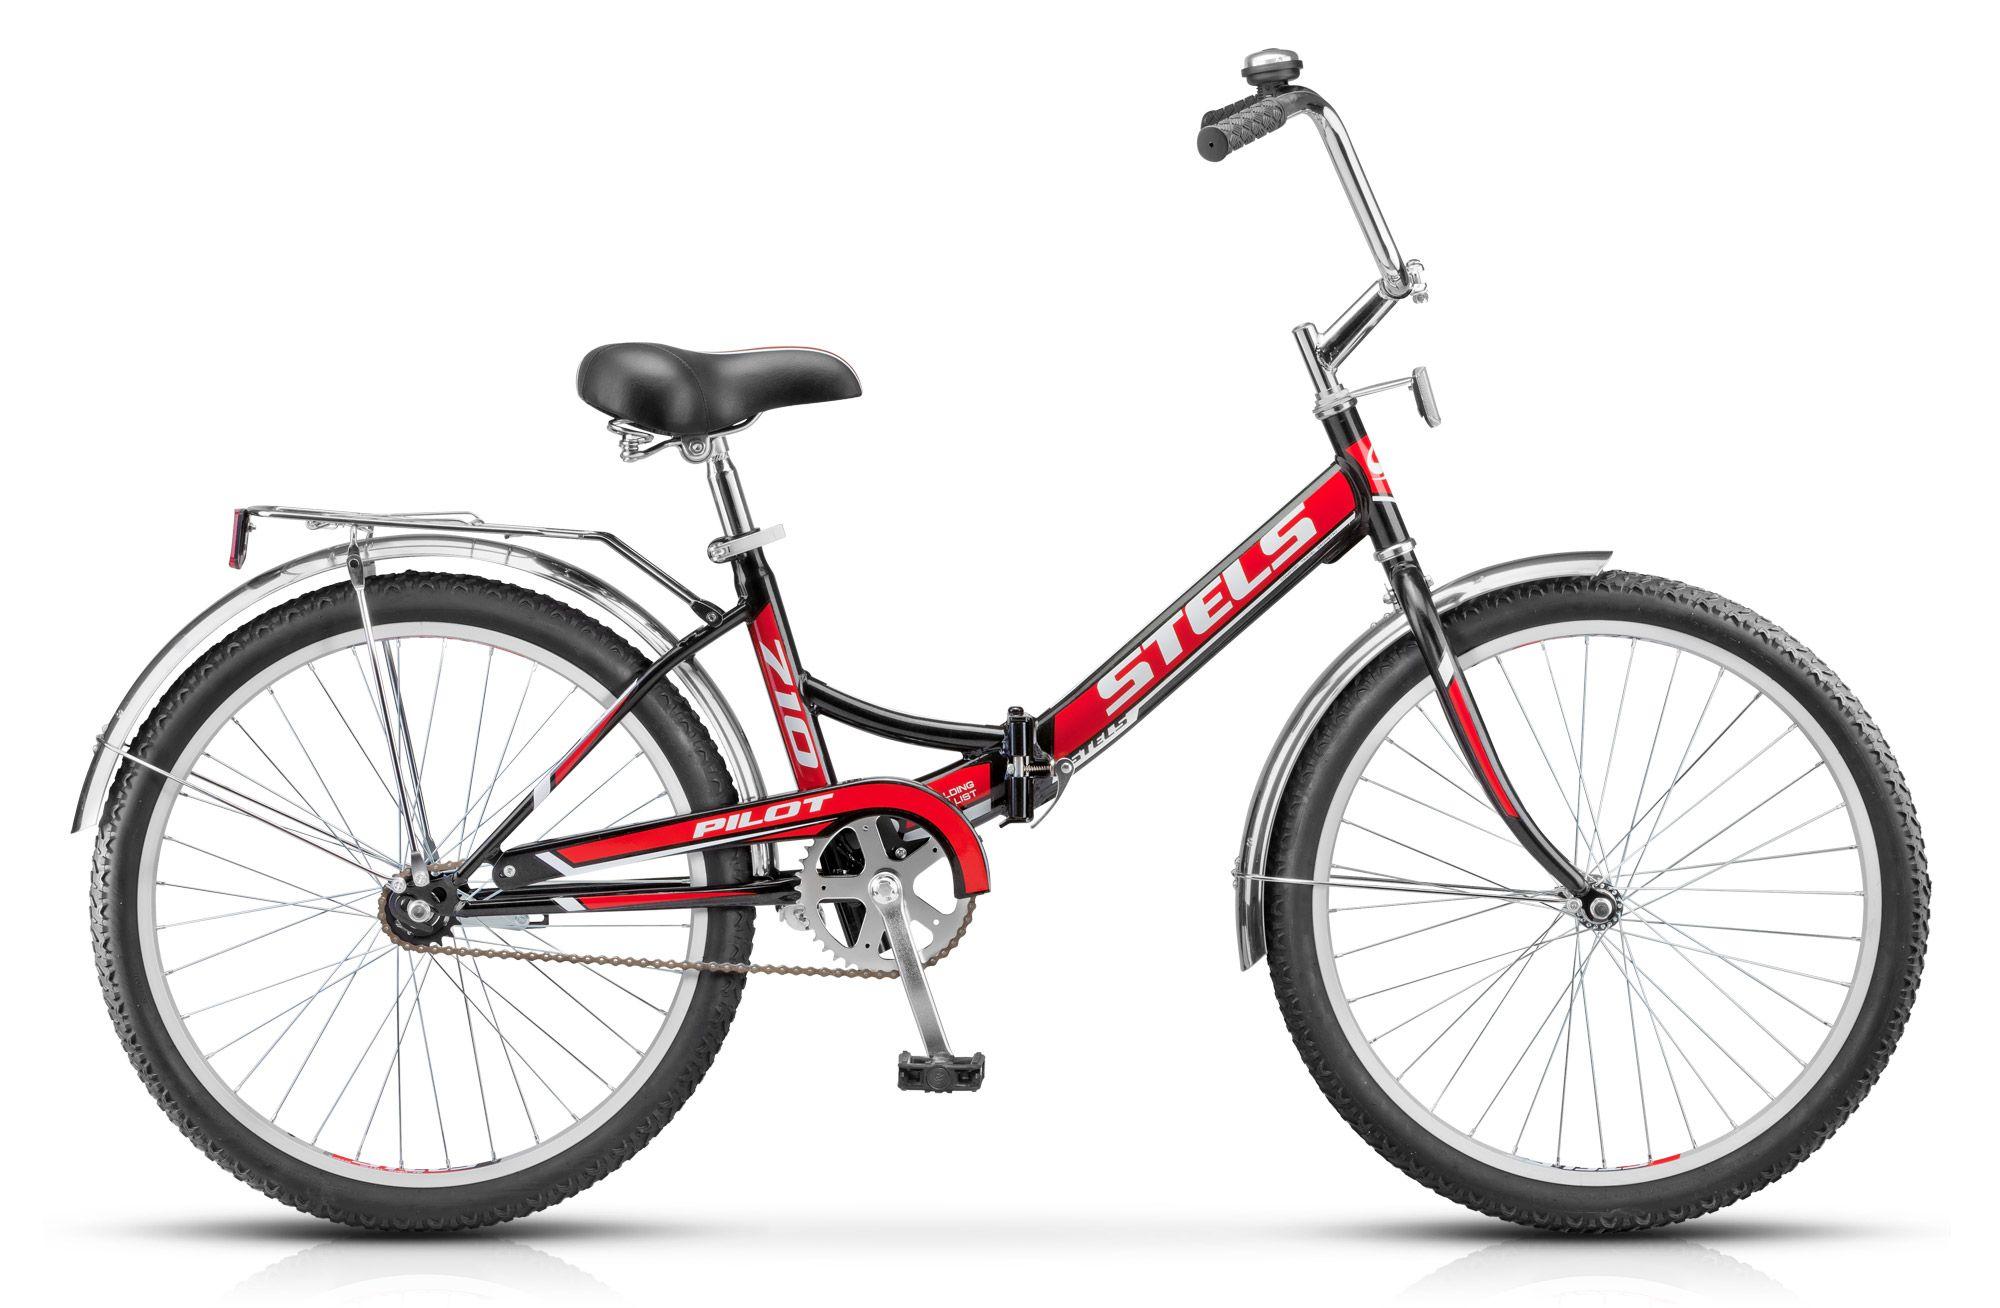 Велосипед Stels Pilot 710 24 (Z010) 2018 stels pilot 710 24 рама 16 белый синий